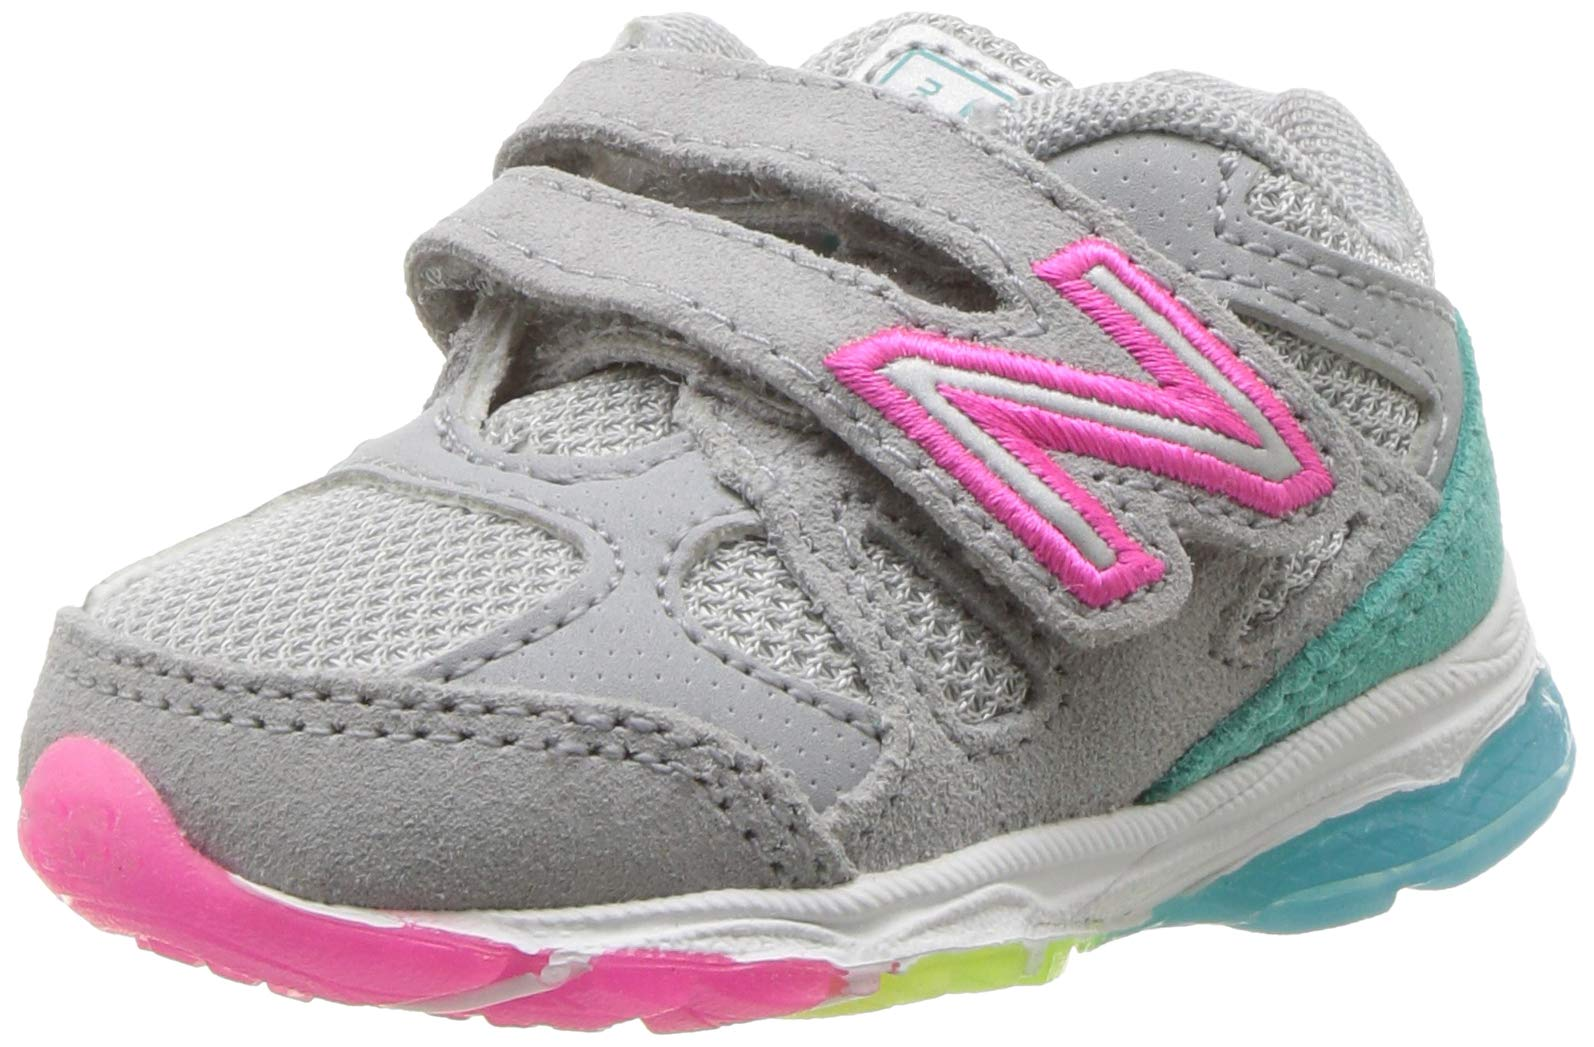 New Balance Girls' 888v1 Hook and Loop Running Shoe, Silver Mink/Rainbow, 8 M US Toddler